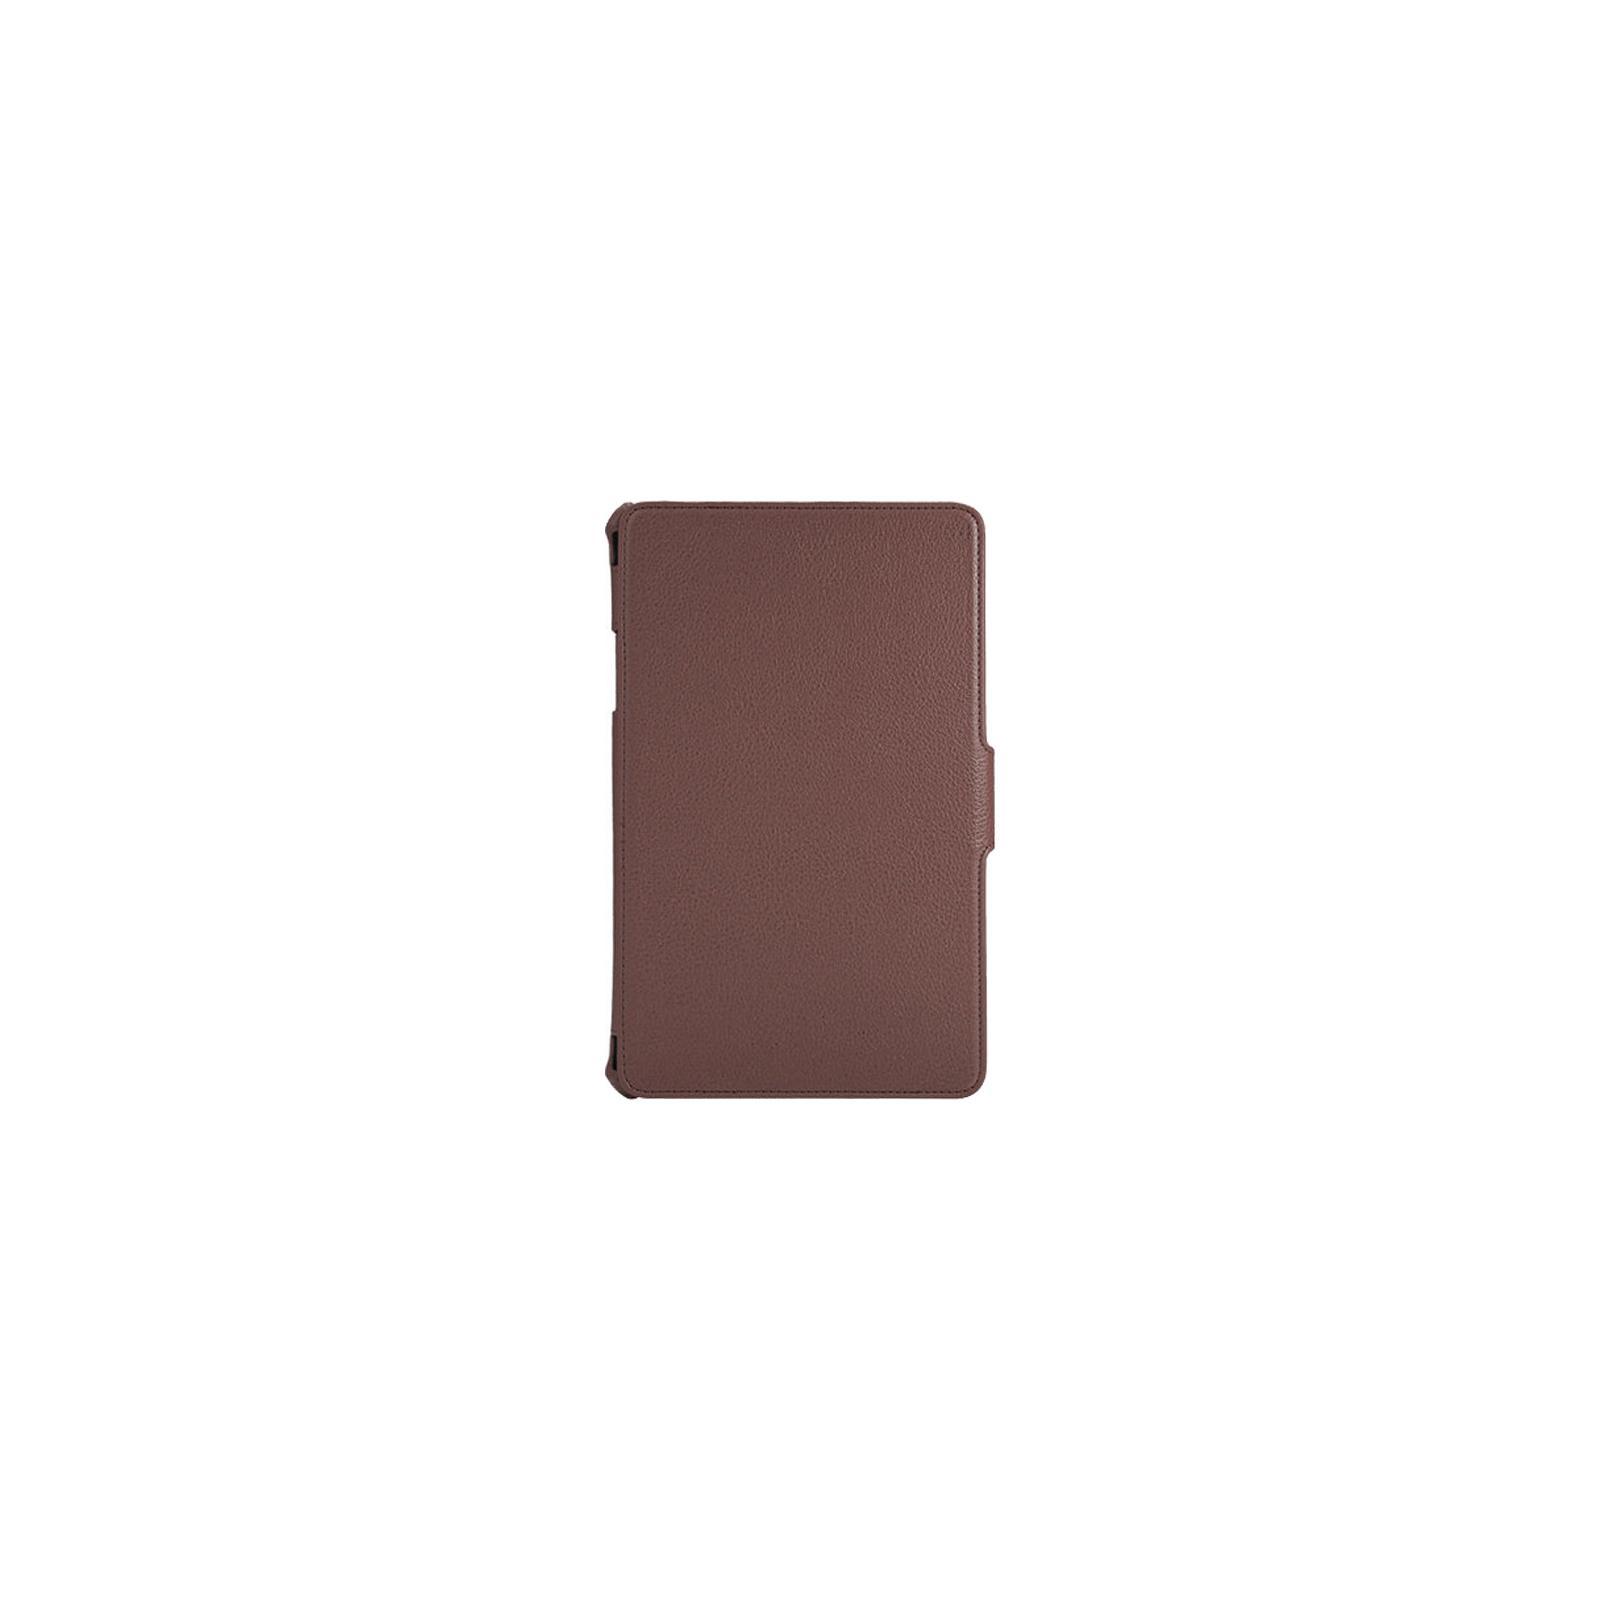 Чехол для планшета AirOn для Samsung Galaxy Tab E 9.6 brown (4822352777128)